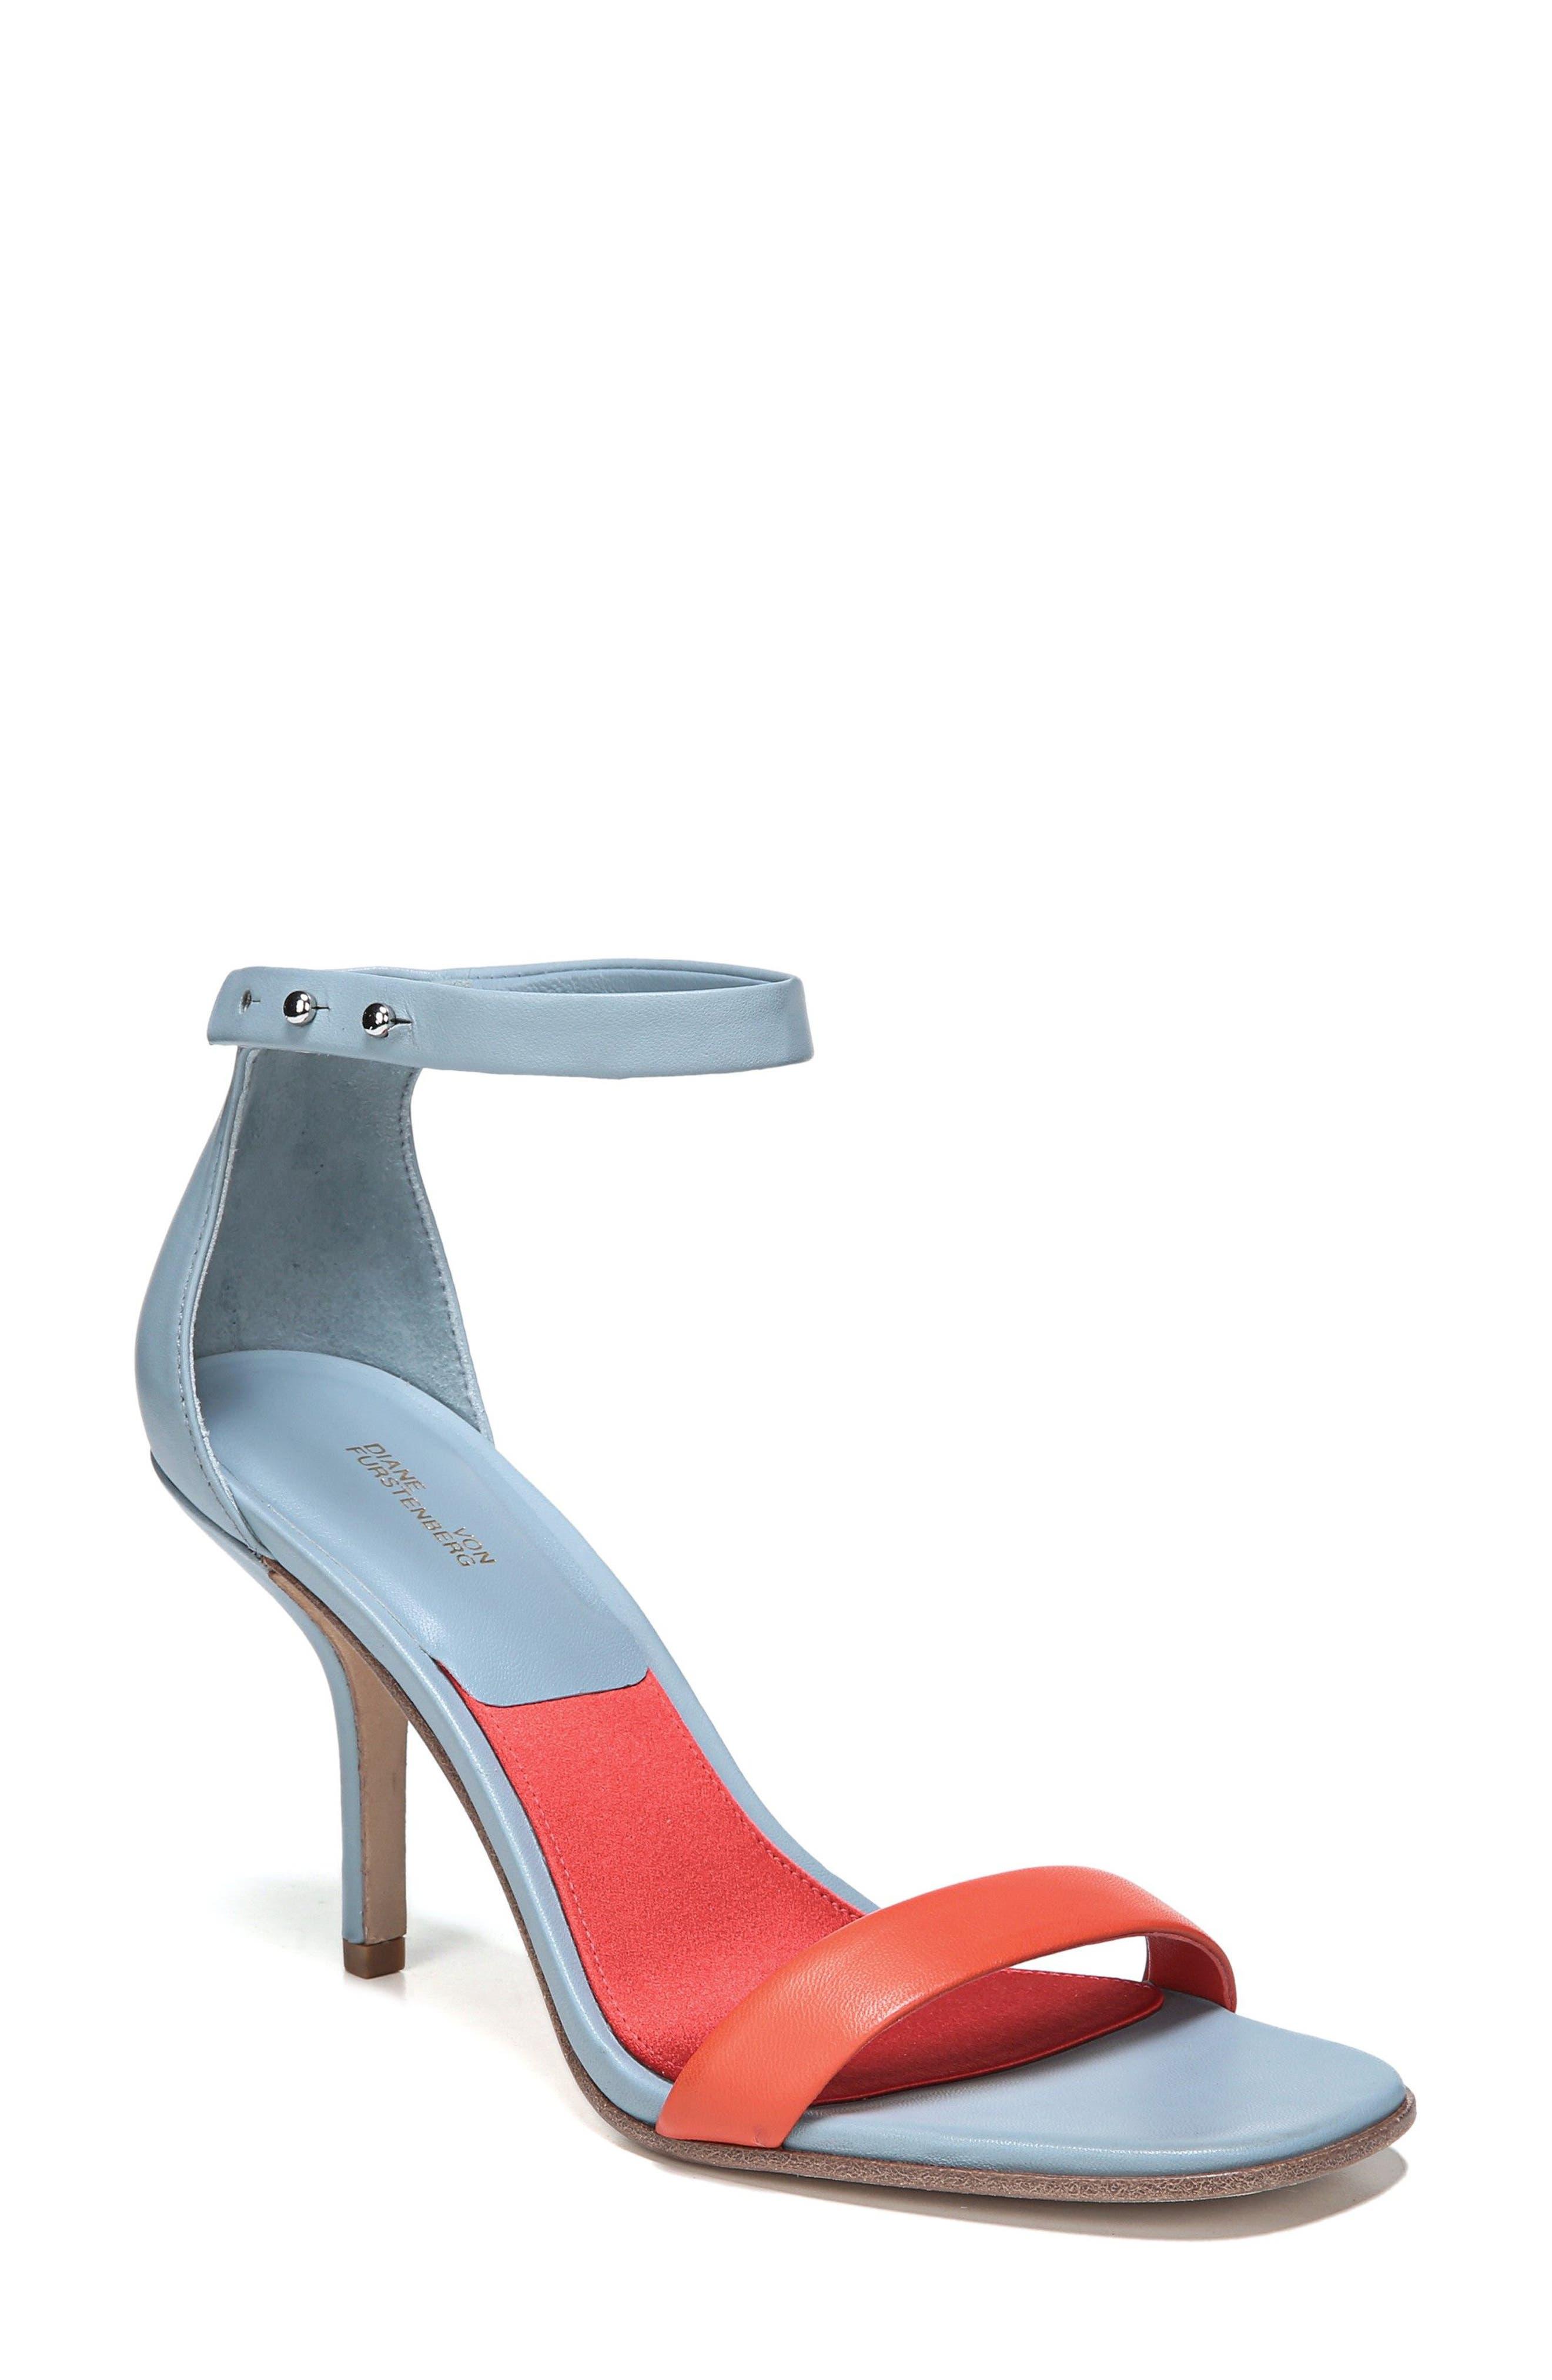 Ferrara Ankle Strap Sandal,                             Main thumbnail 2, color,